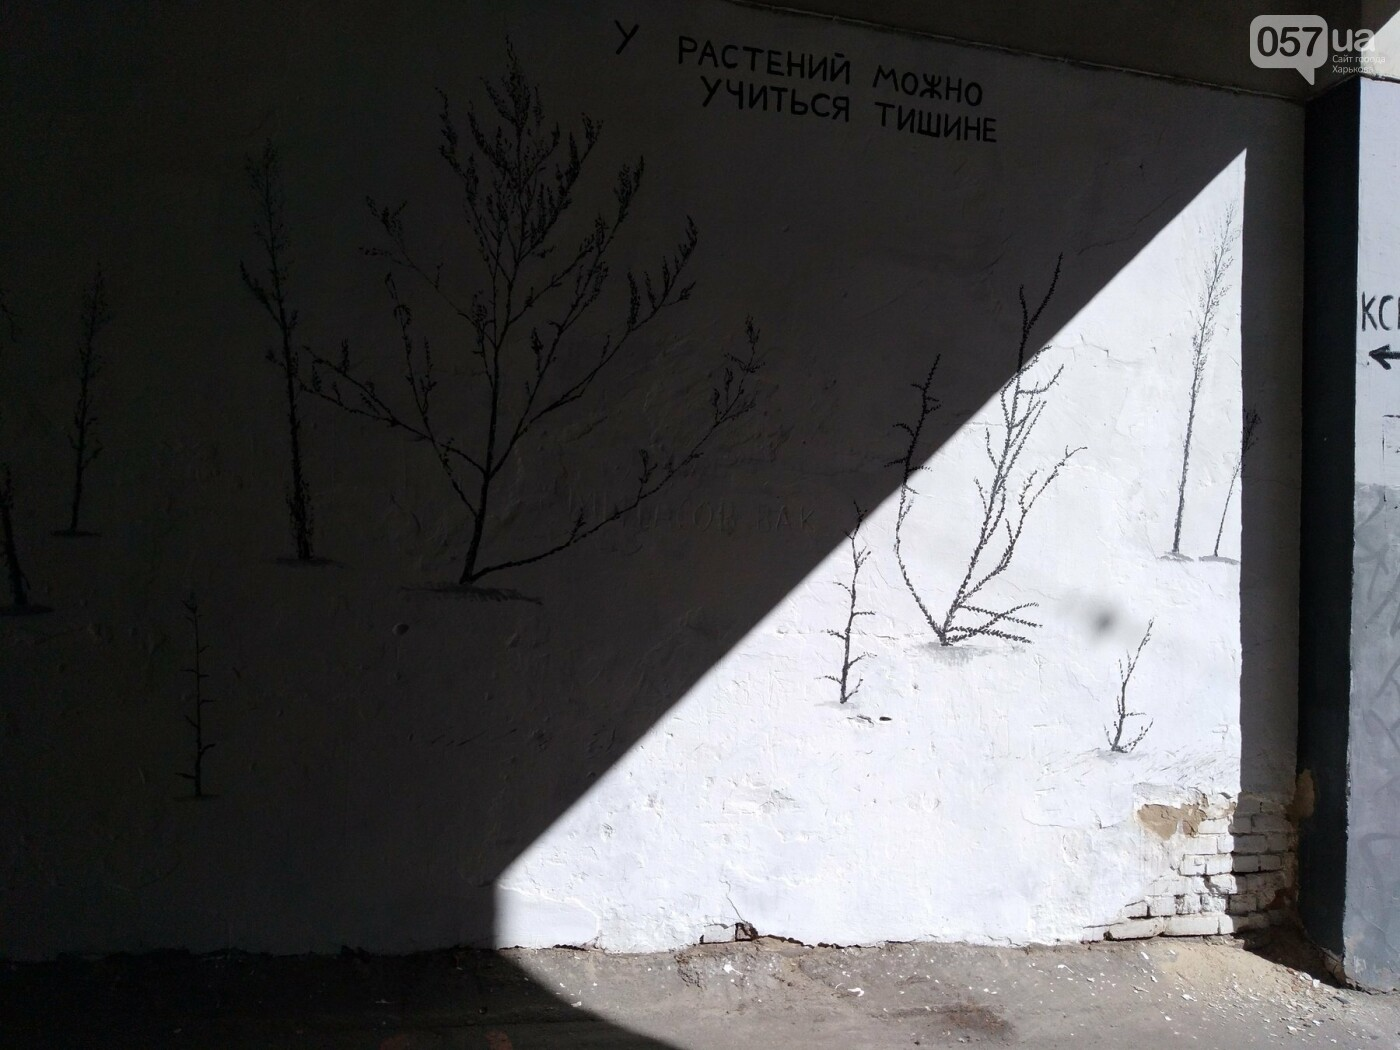 Стрит-арт Гамлета в Харькове: ТОП-10 граффити художника, - ФОТО, фото-21